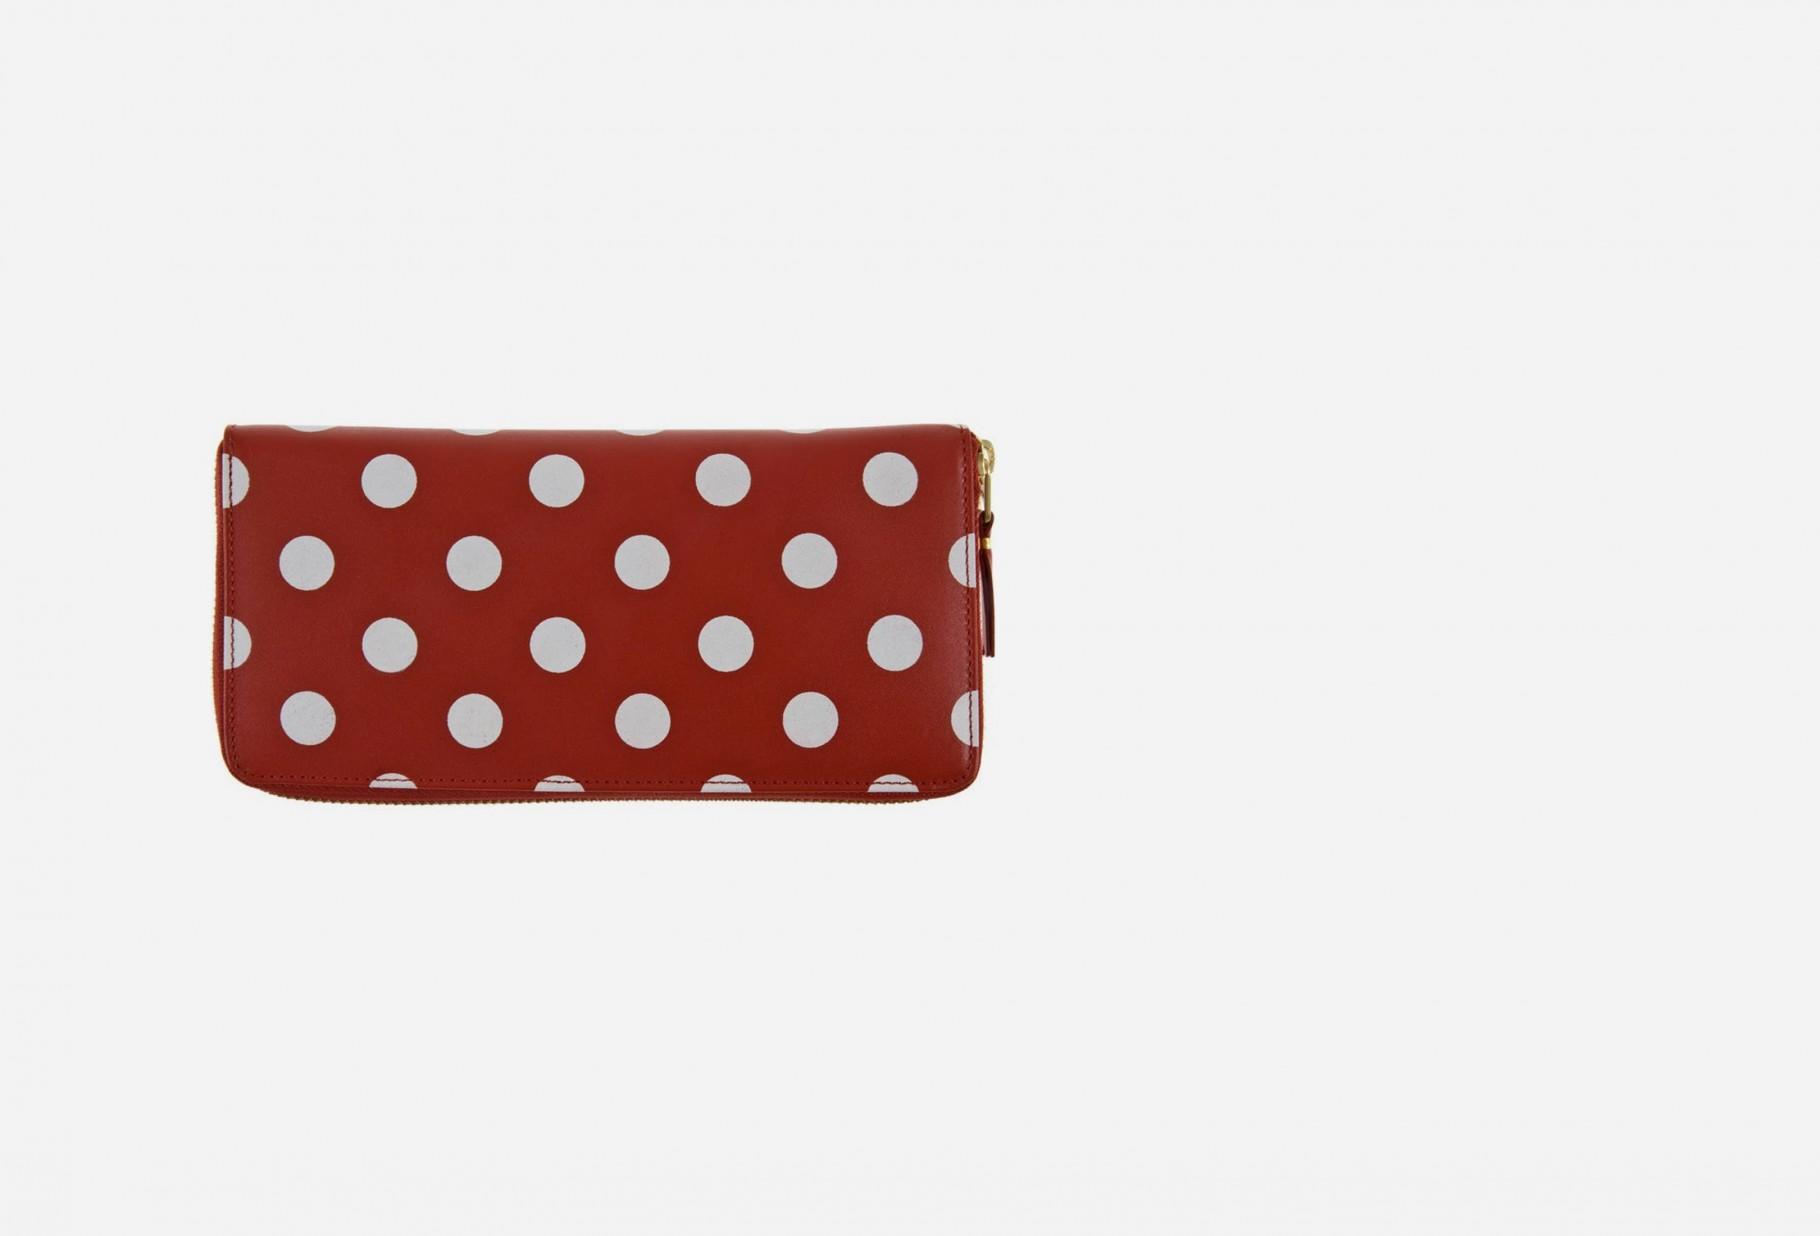 COMME DES GARÇONS WALLETS / Cdg polka dots sa0110pd Red